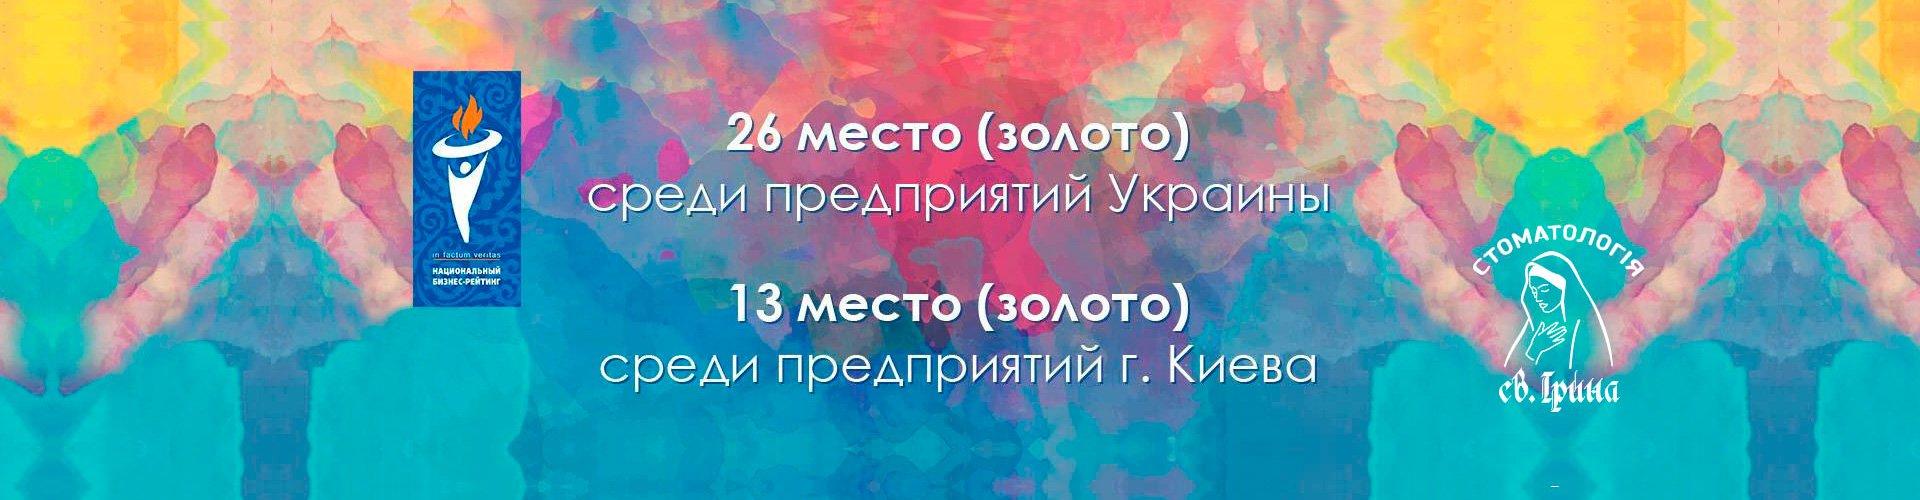 Награды клиники Святая Ирина среди предприятий Украины и г. Киева